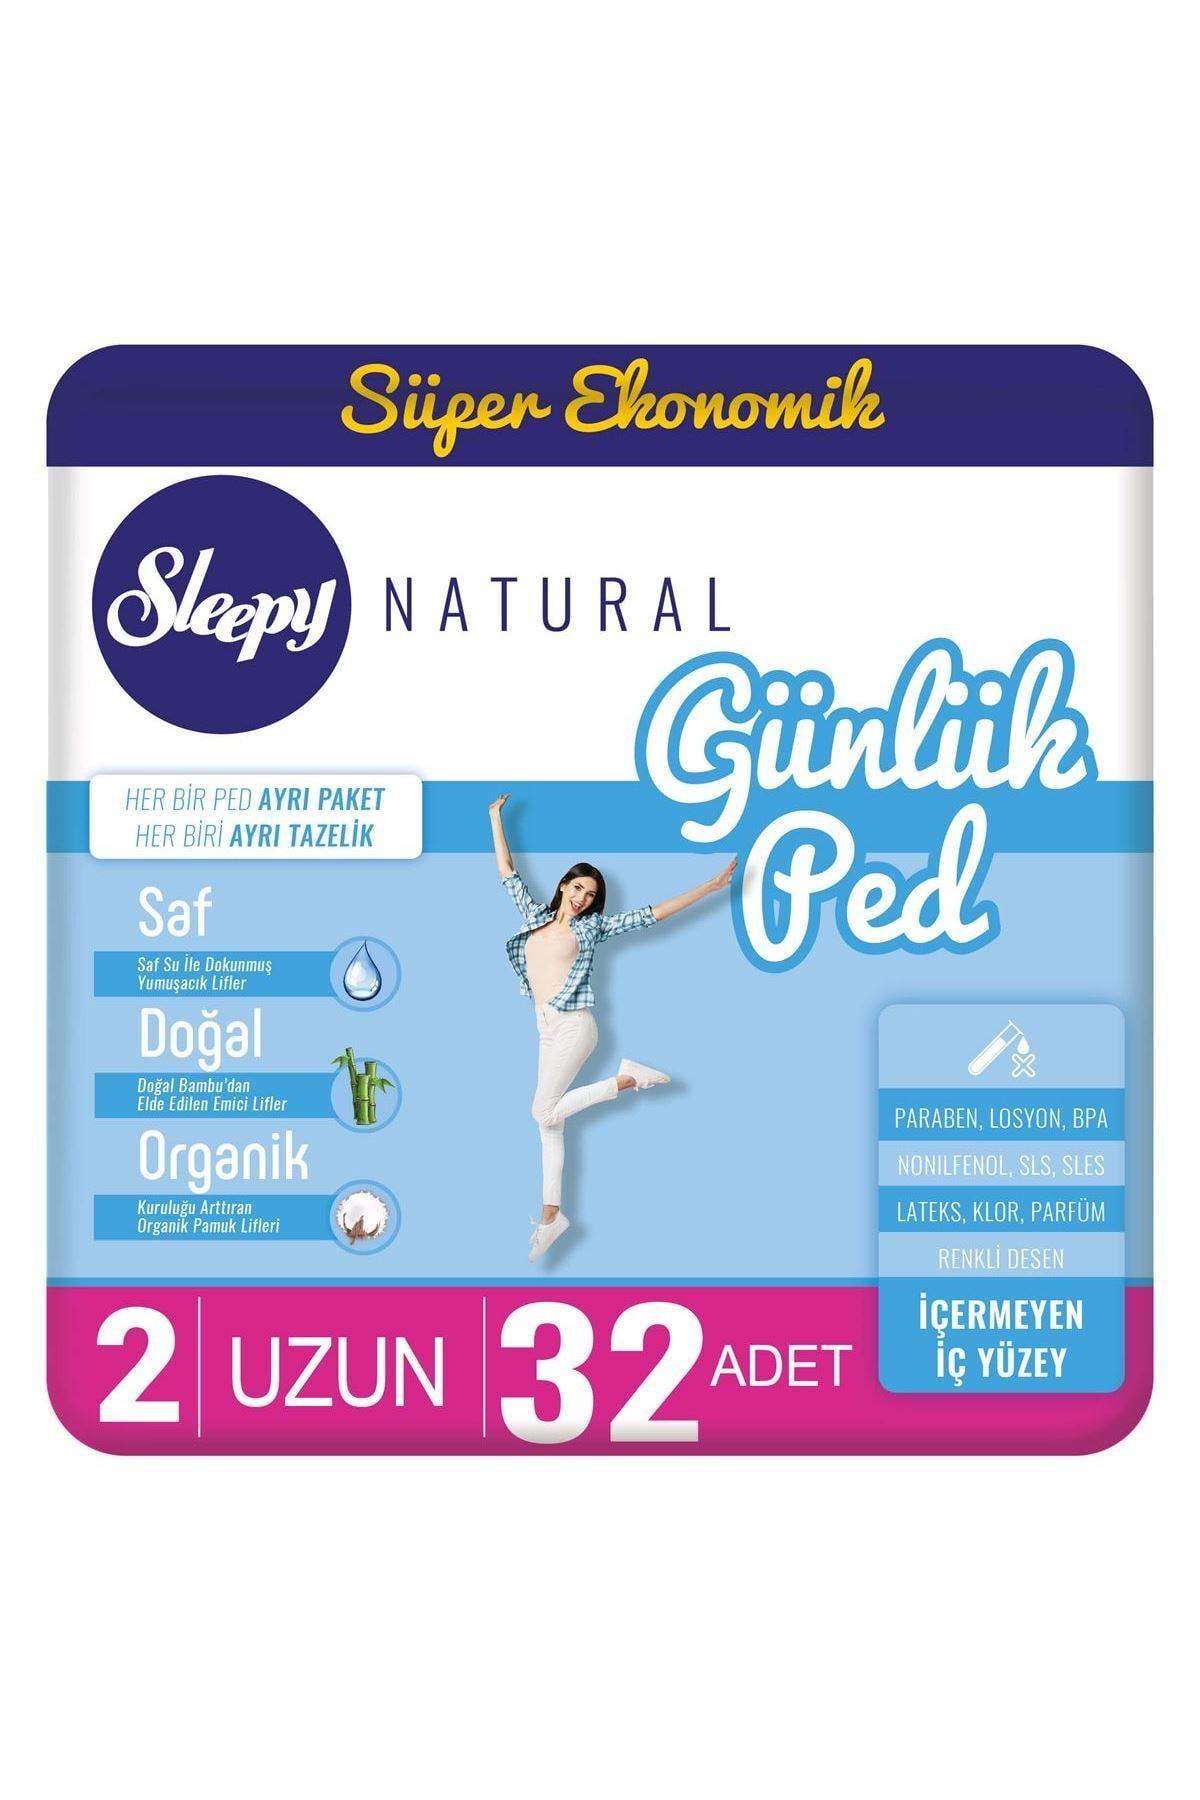 Sleepy Natural Günlük Uzun Ped 32 Adet